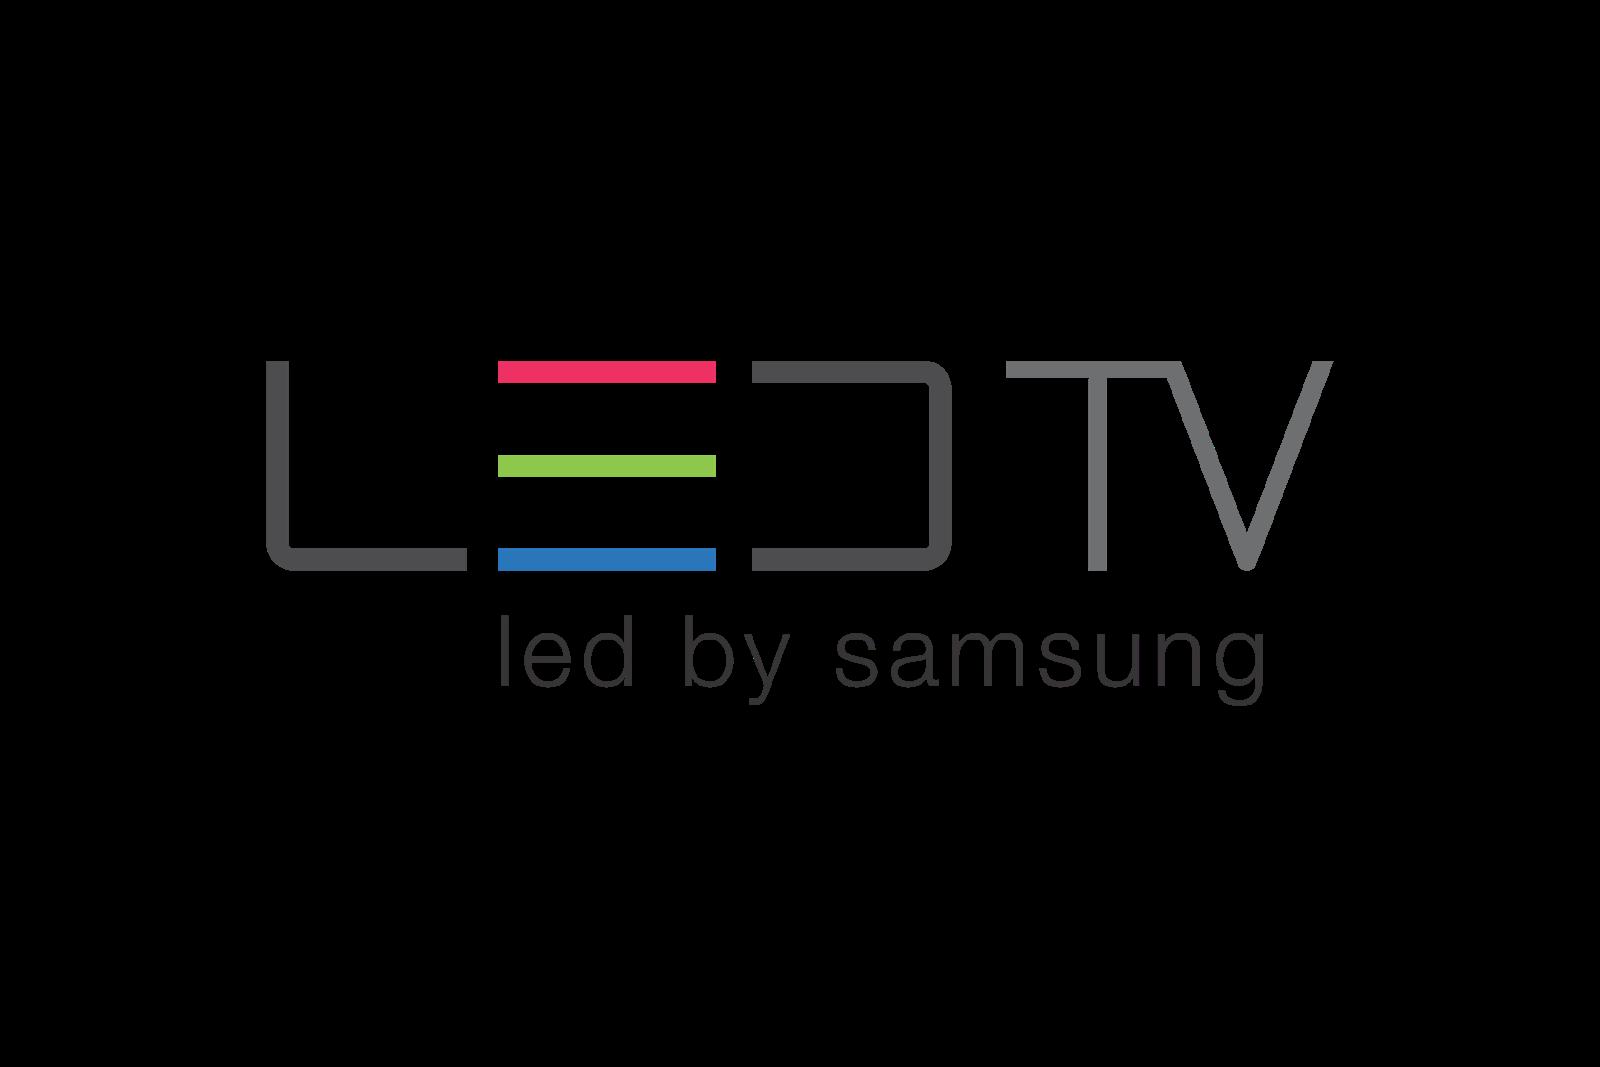 samsung led tv logo. samsung led tv logo e